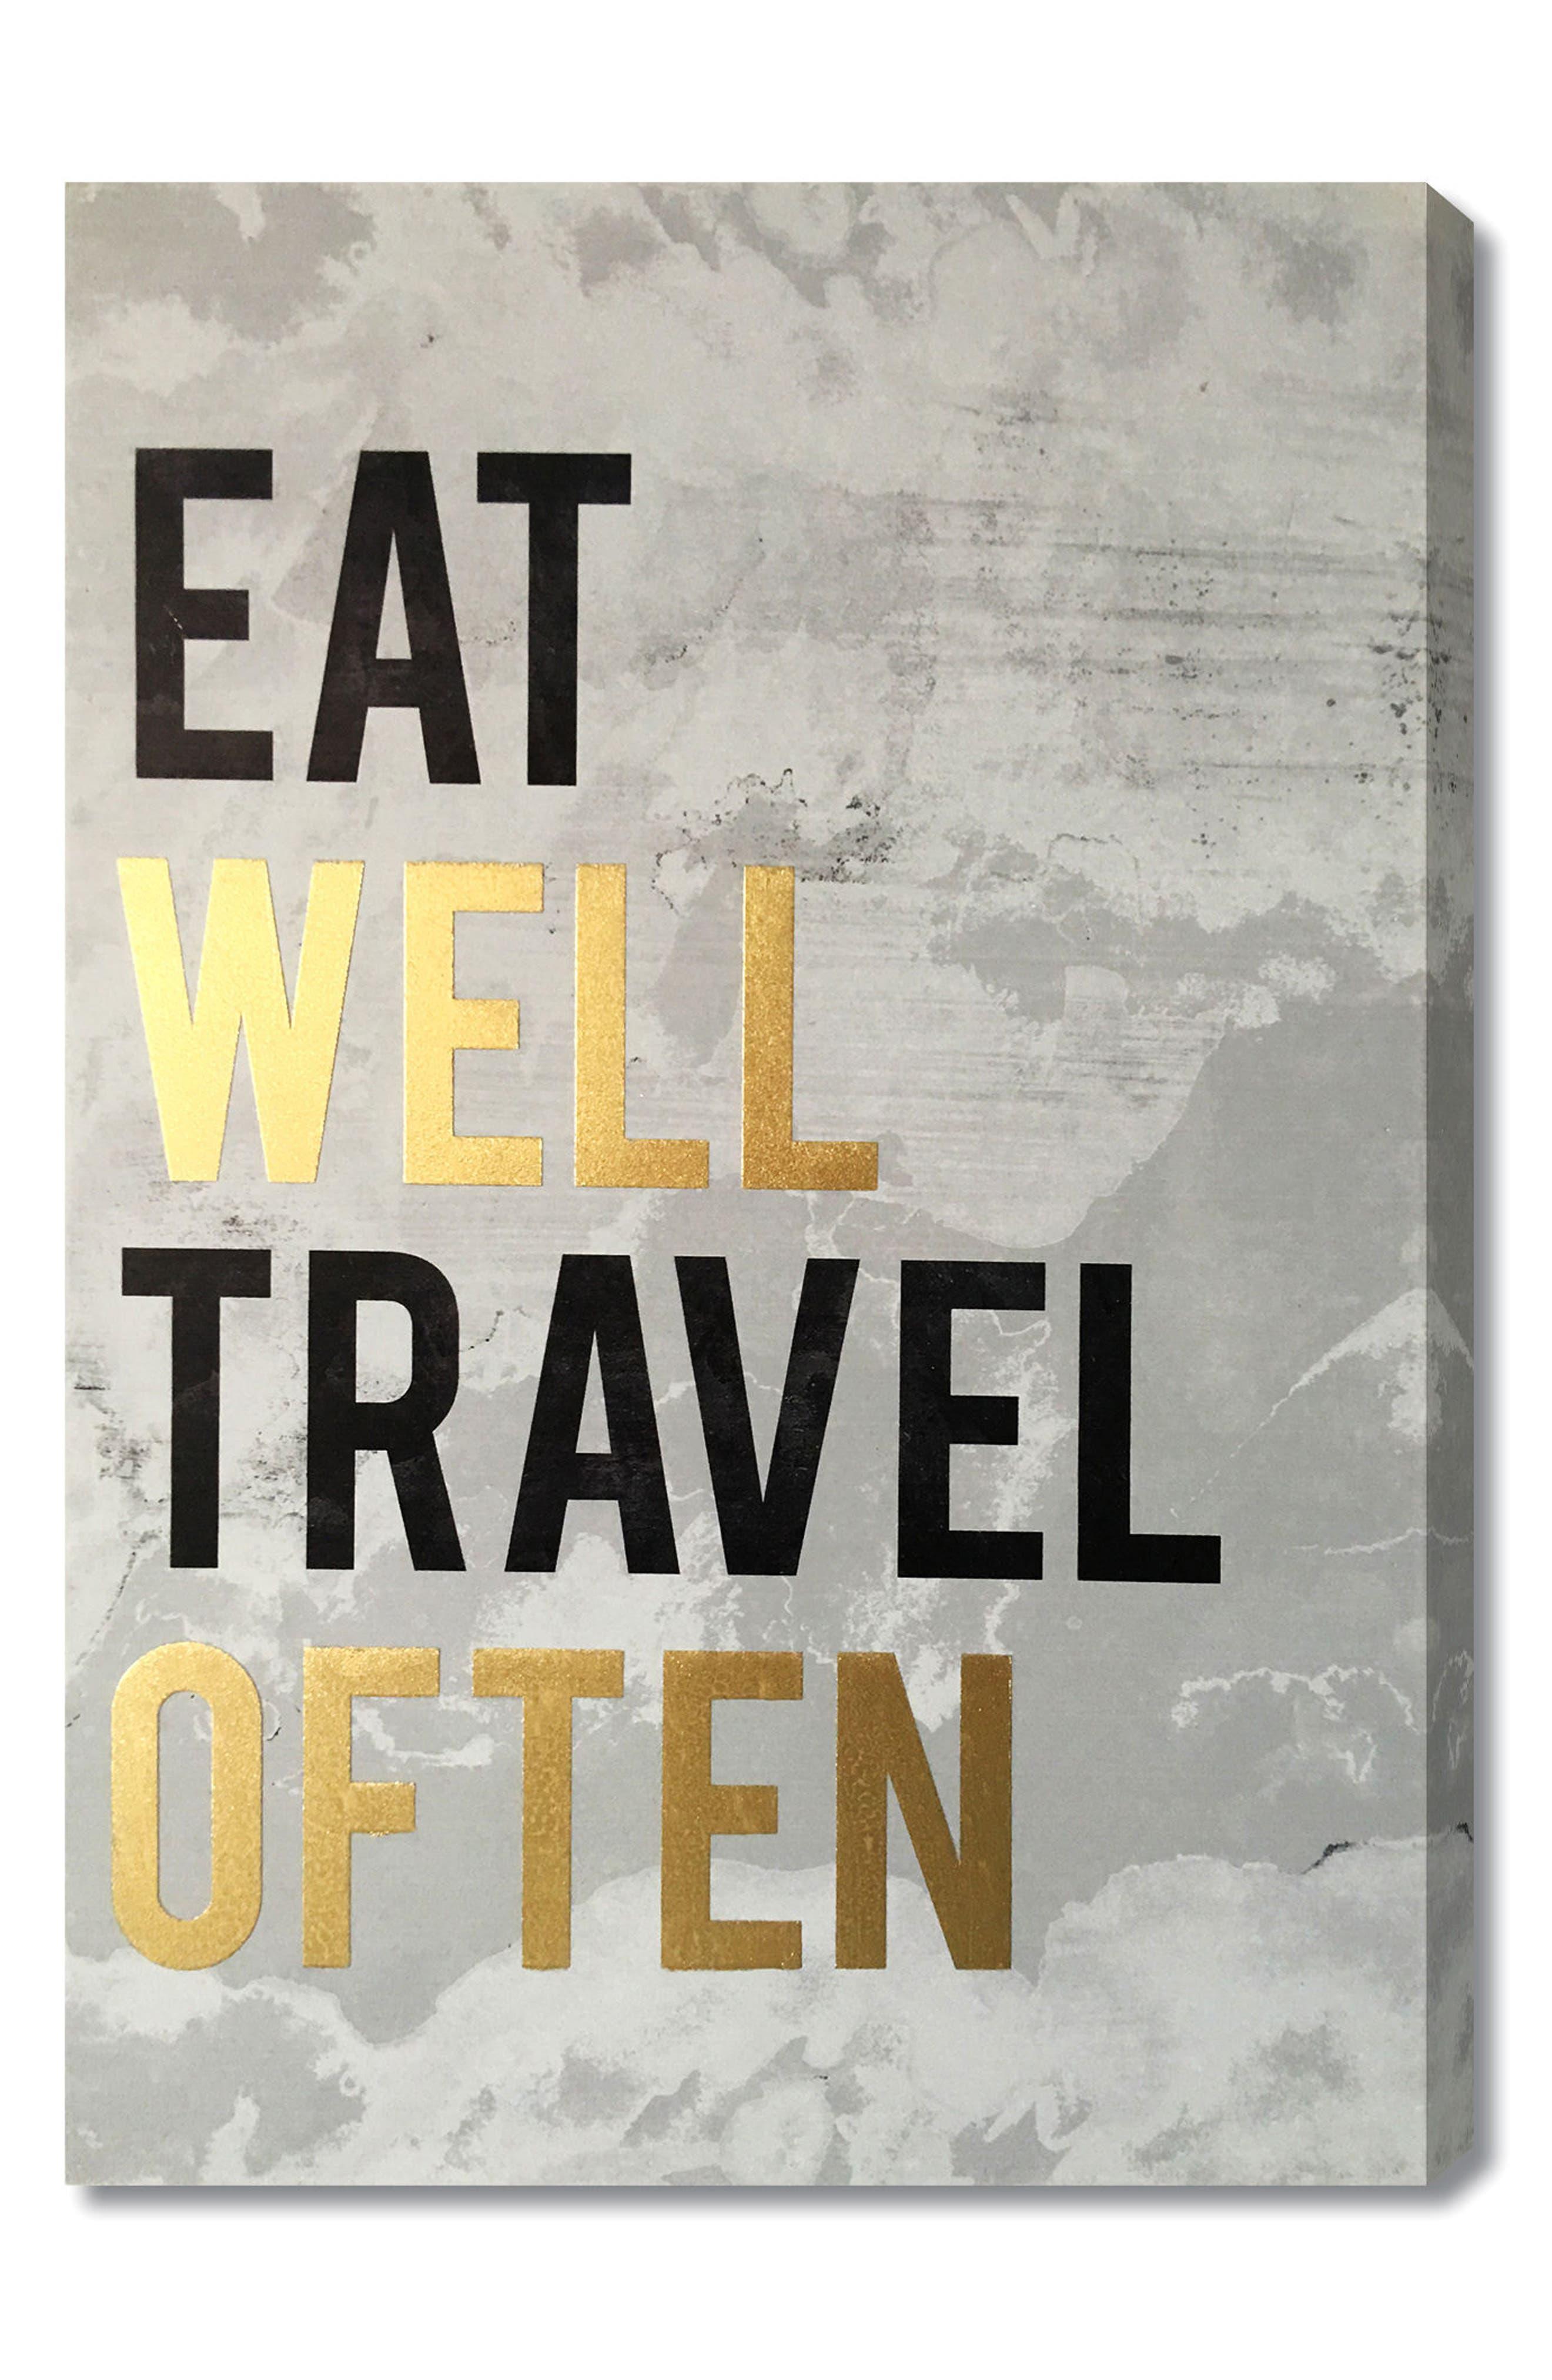 Wynwood Eat Well Travel Often Wall Art,                             Main thumbnail 1, color,                             020